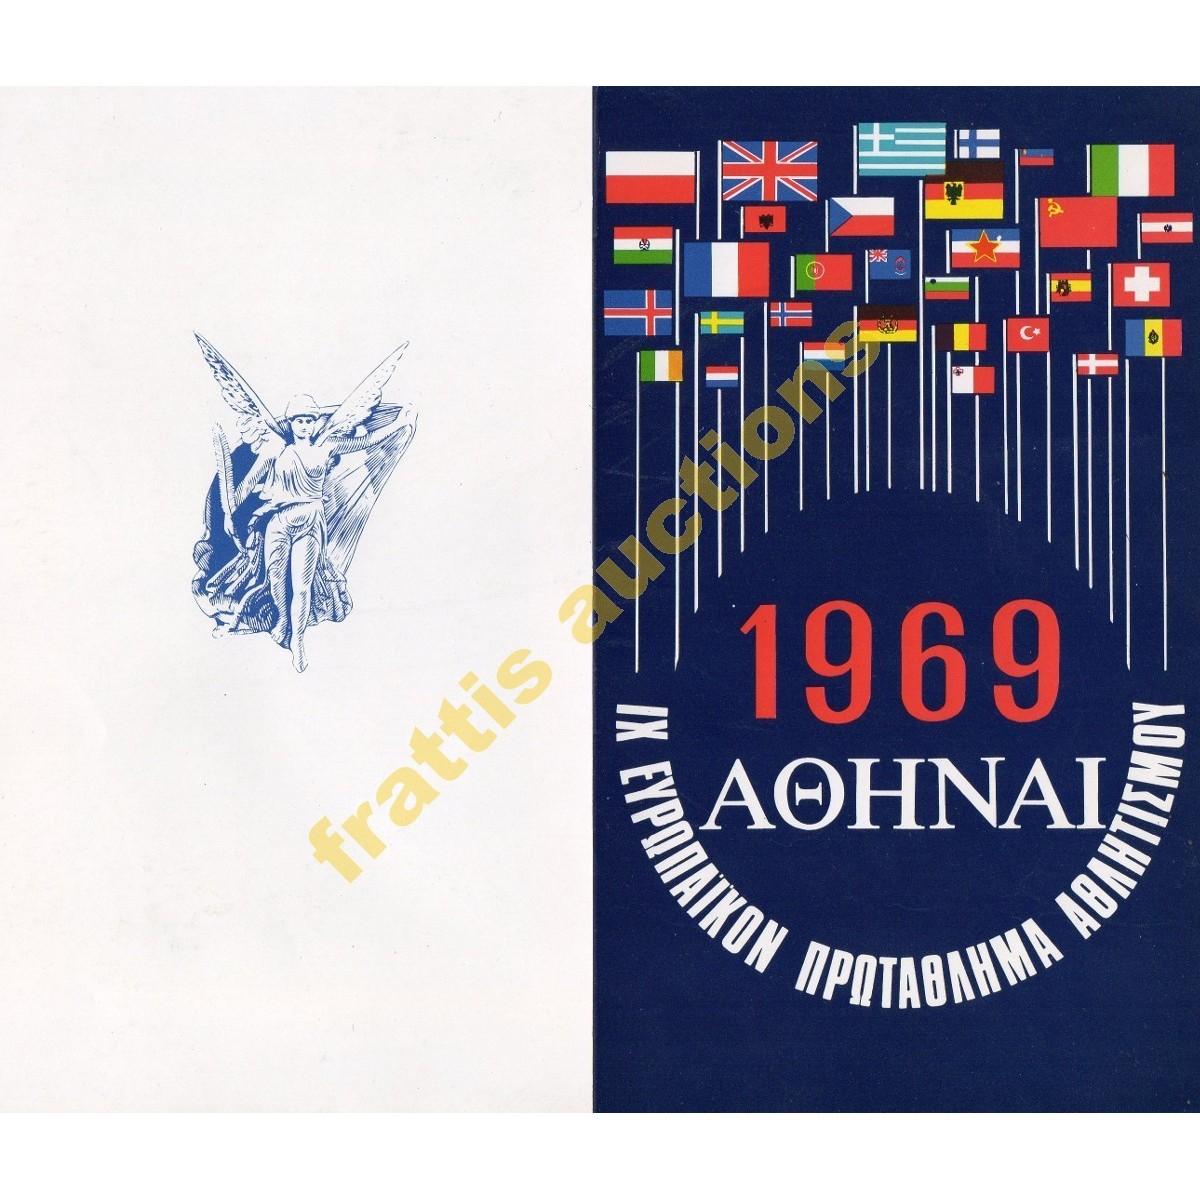 IX EUROPIAN CHAMPIONSHIP ATHENS 1969, postcard.